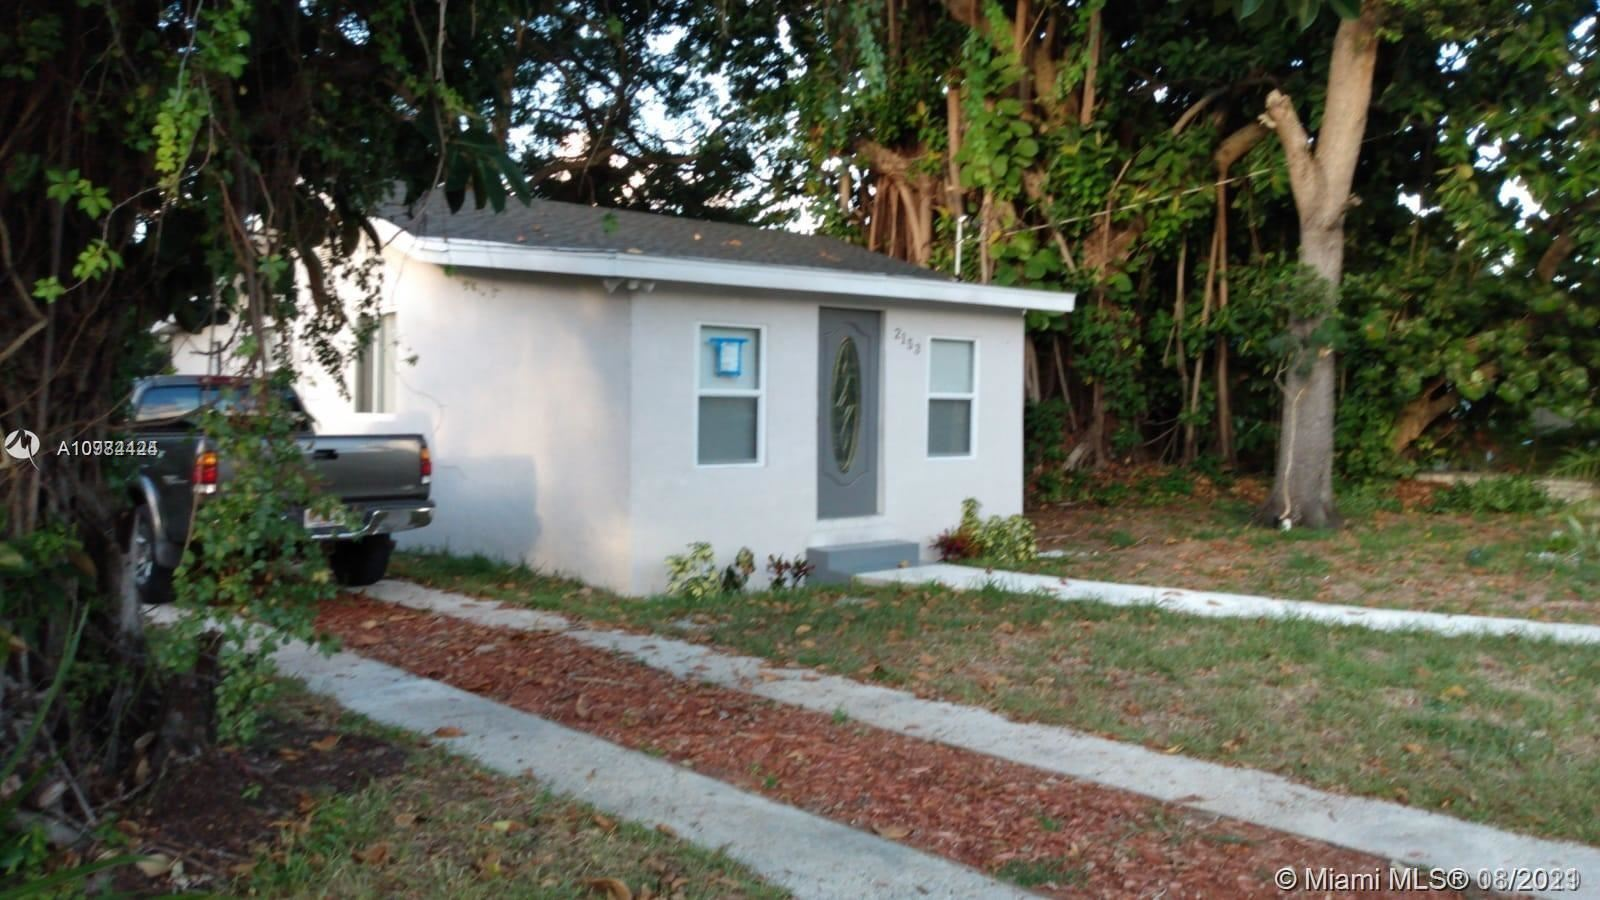 2153 NW 91st St, Miami, FL 33147 - #: A10984424